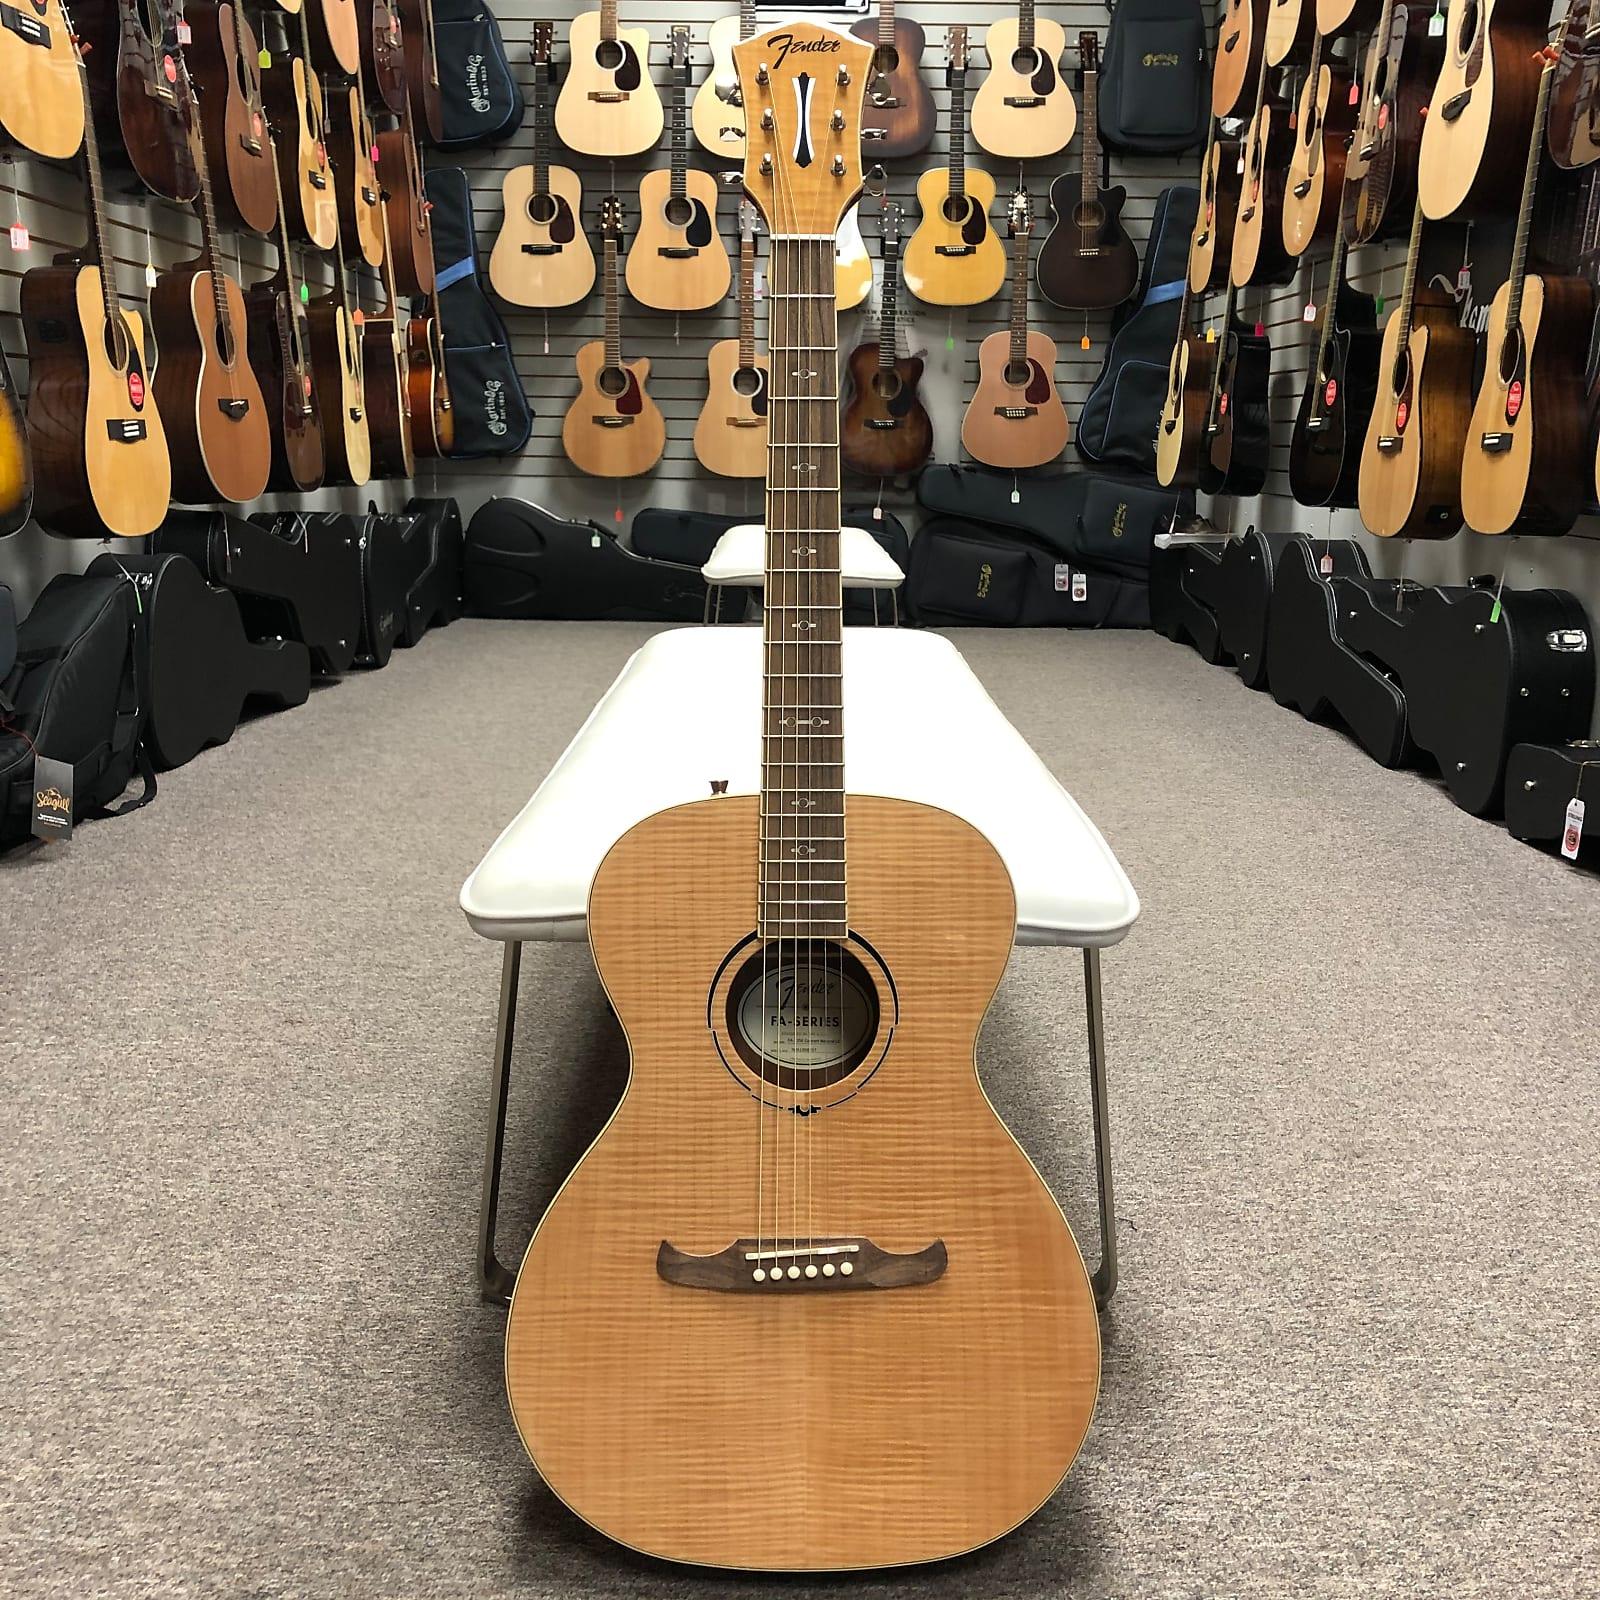 Fender FA-235E Concert Acoustic/Electric Guitar - Natural